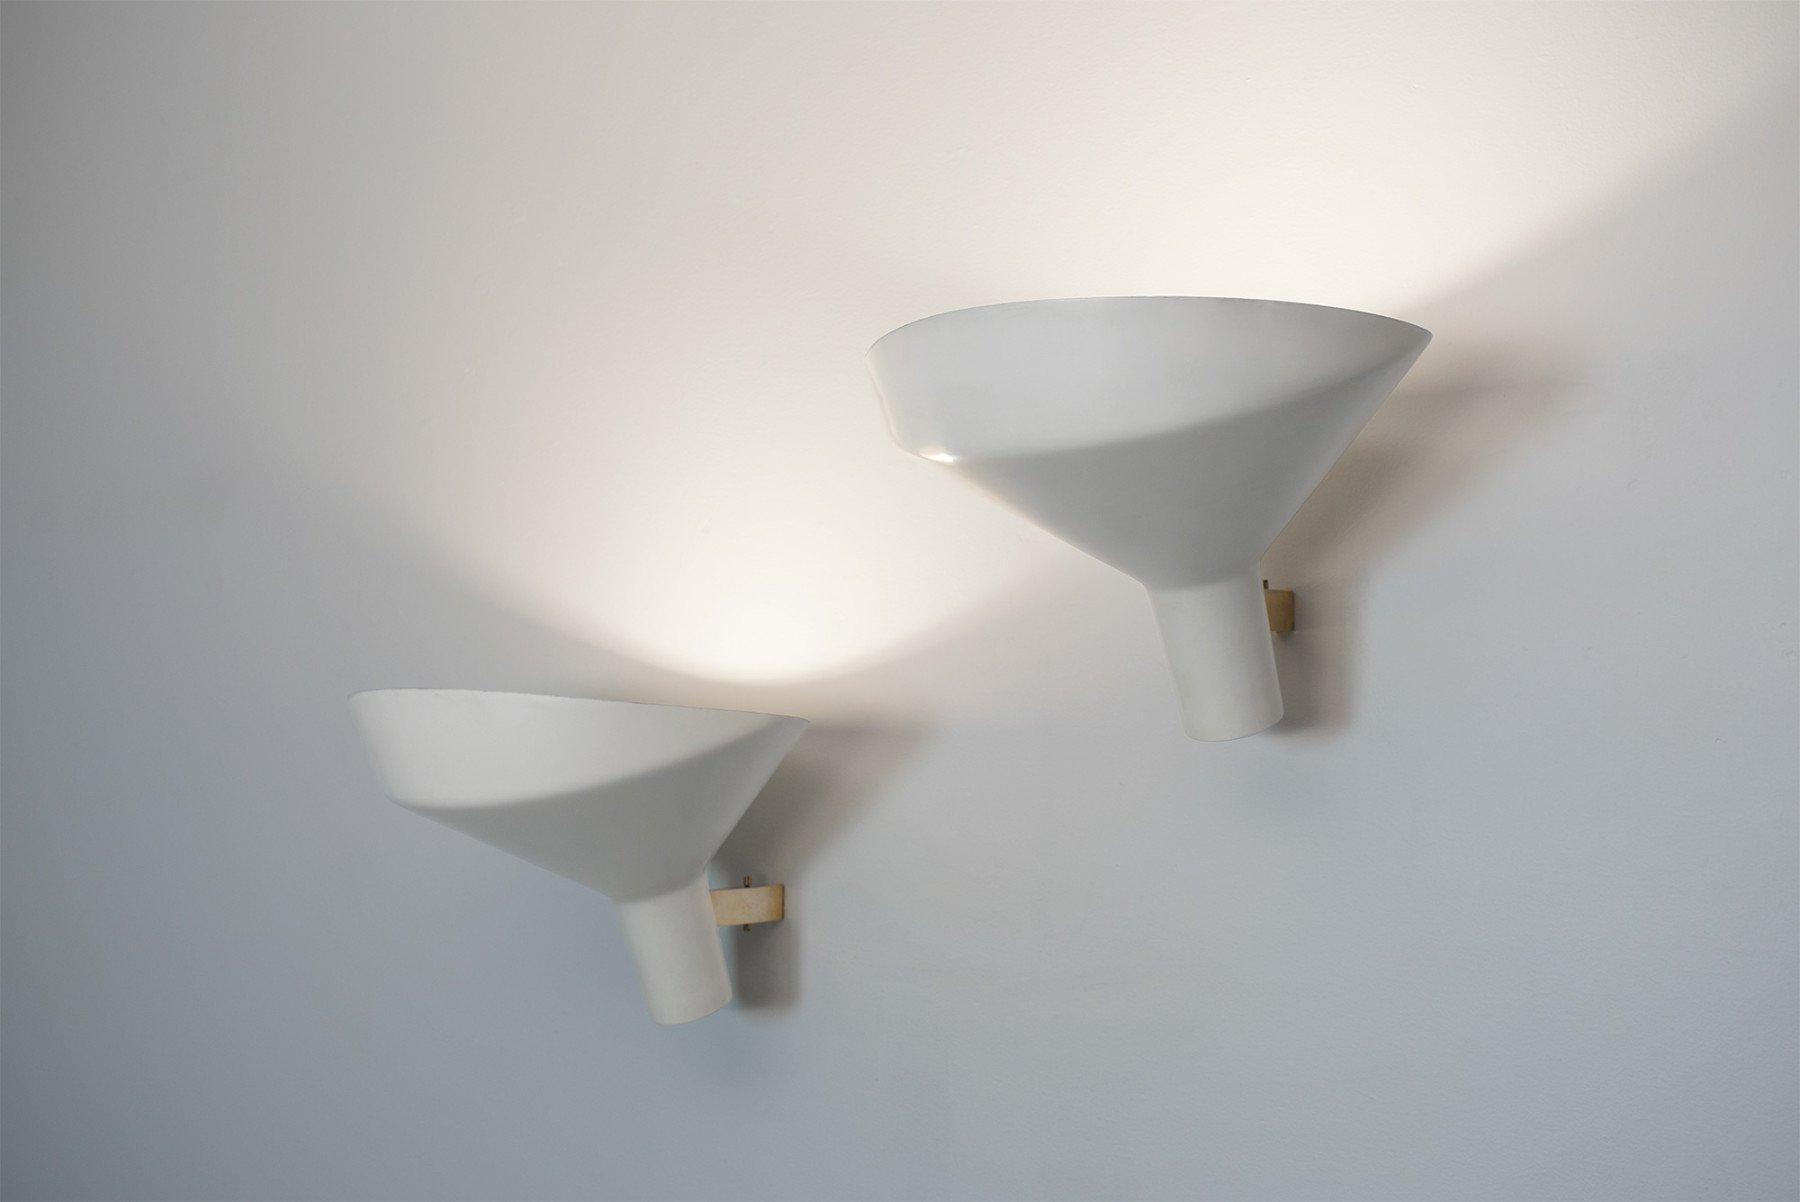 Gino Sarfatti |   Wall light, model 225